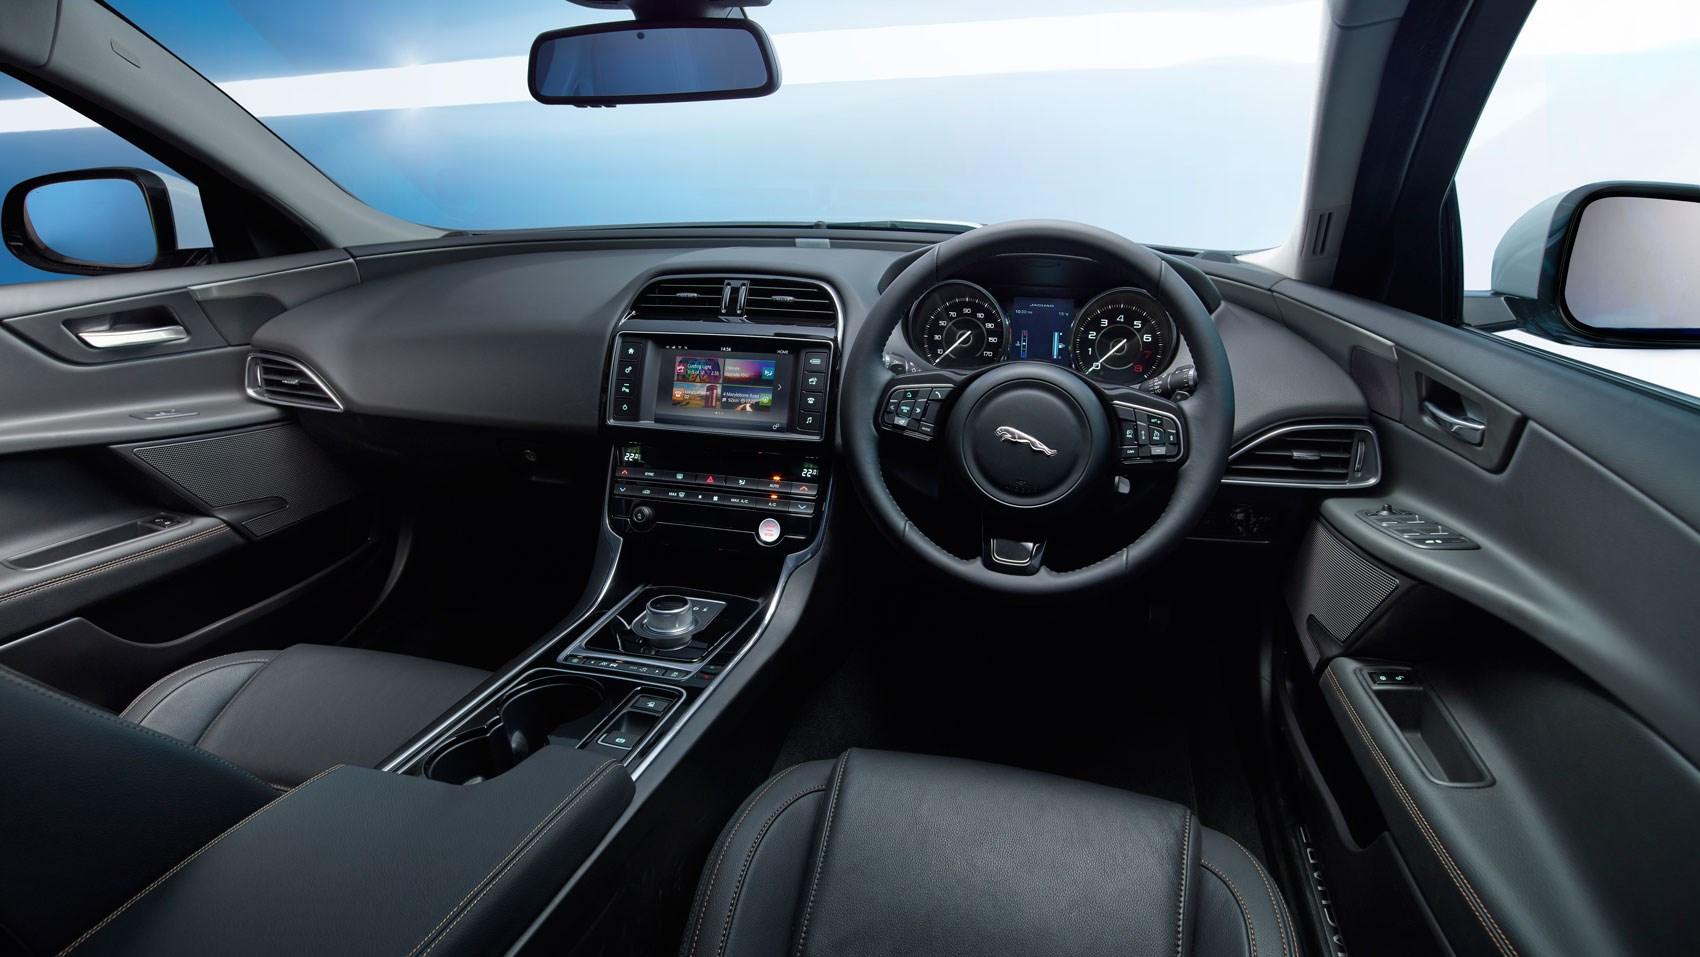 jaguar xe 2 0 d 163 r sport 2015 review car magazine. Black Bedroom Furniture Sets. Home Design Ideas